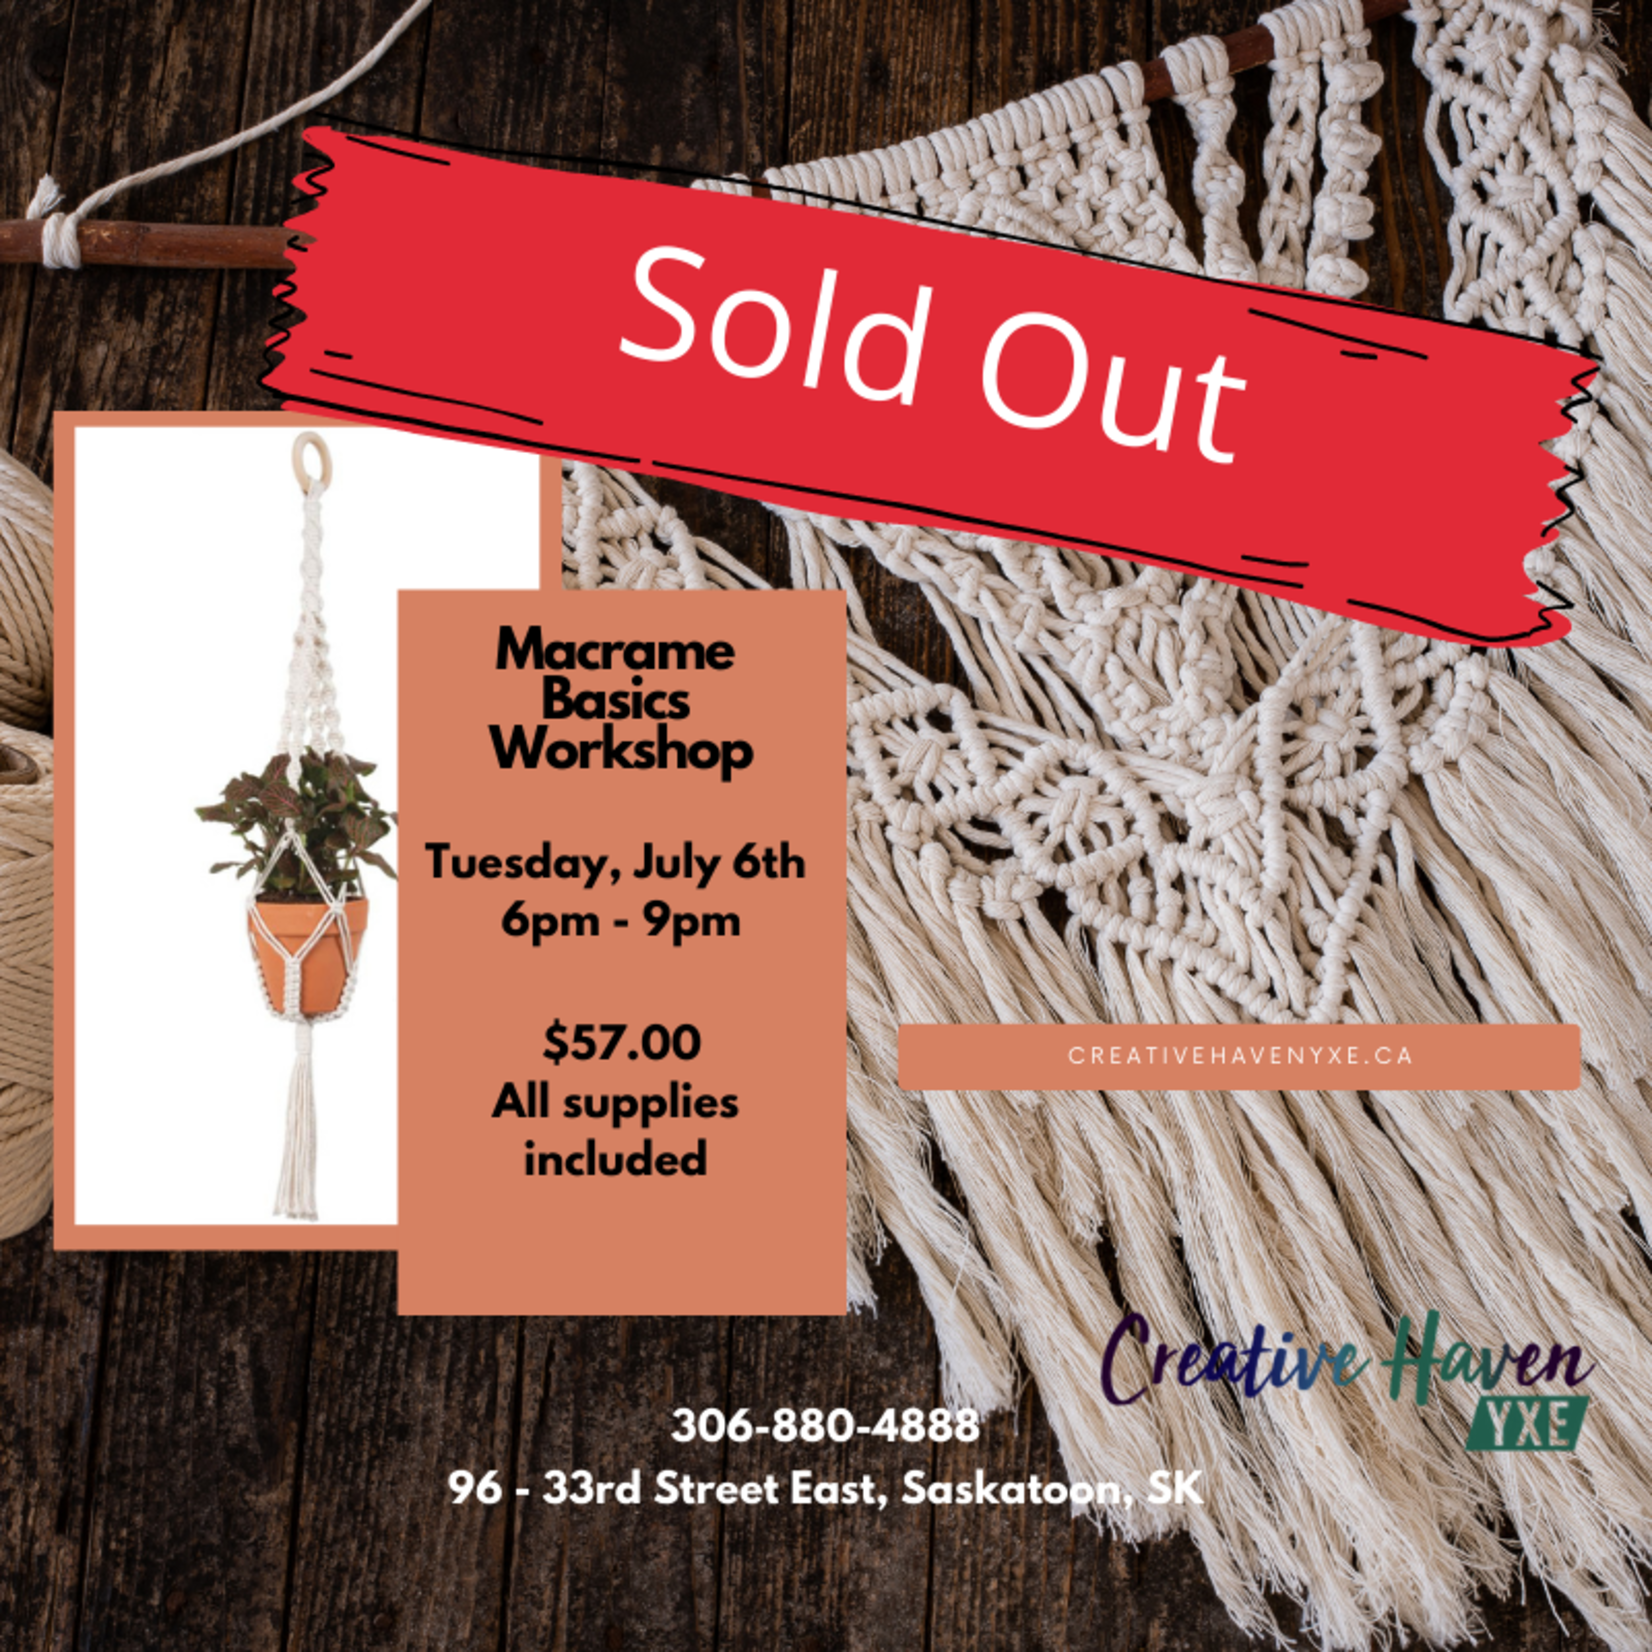 Sold Out - Macrame Basics Workshop - July 6th 6pm-9pm